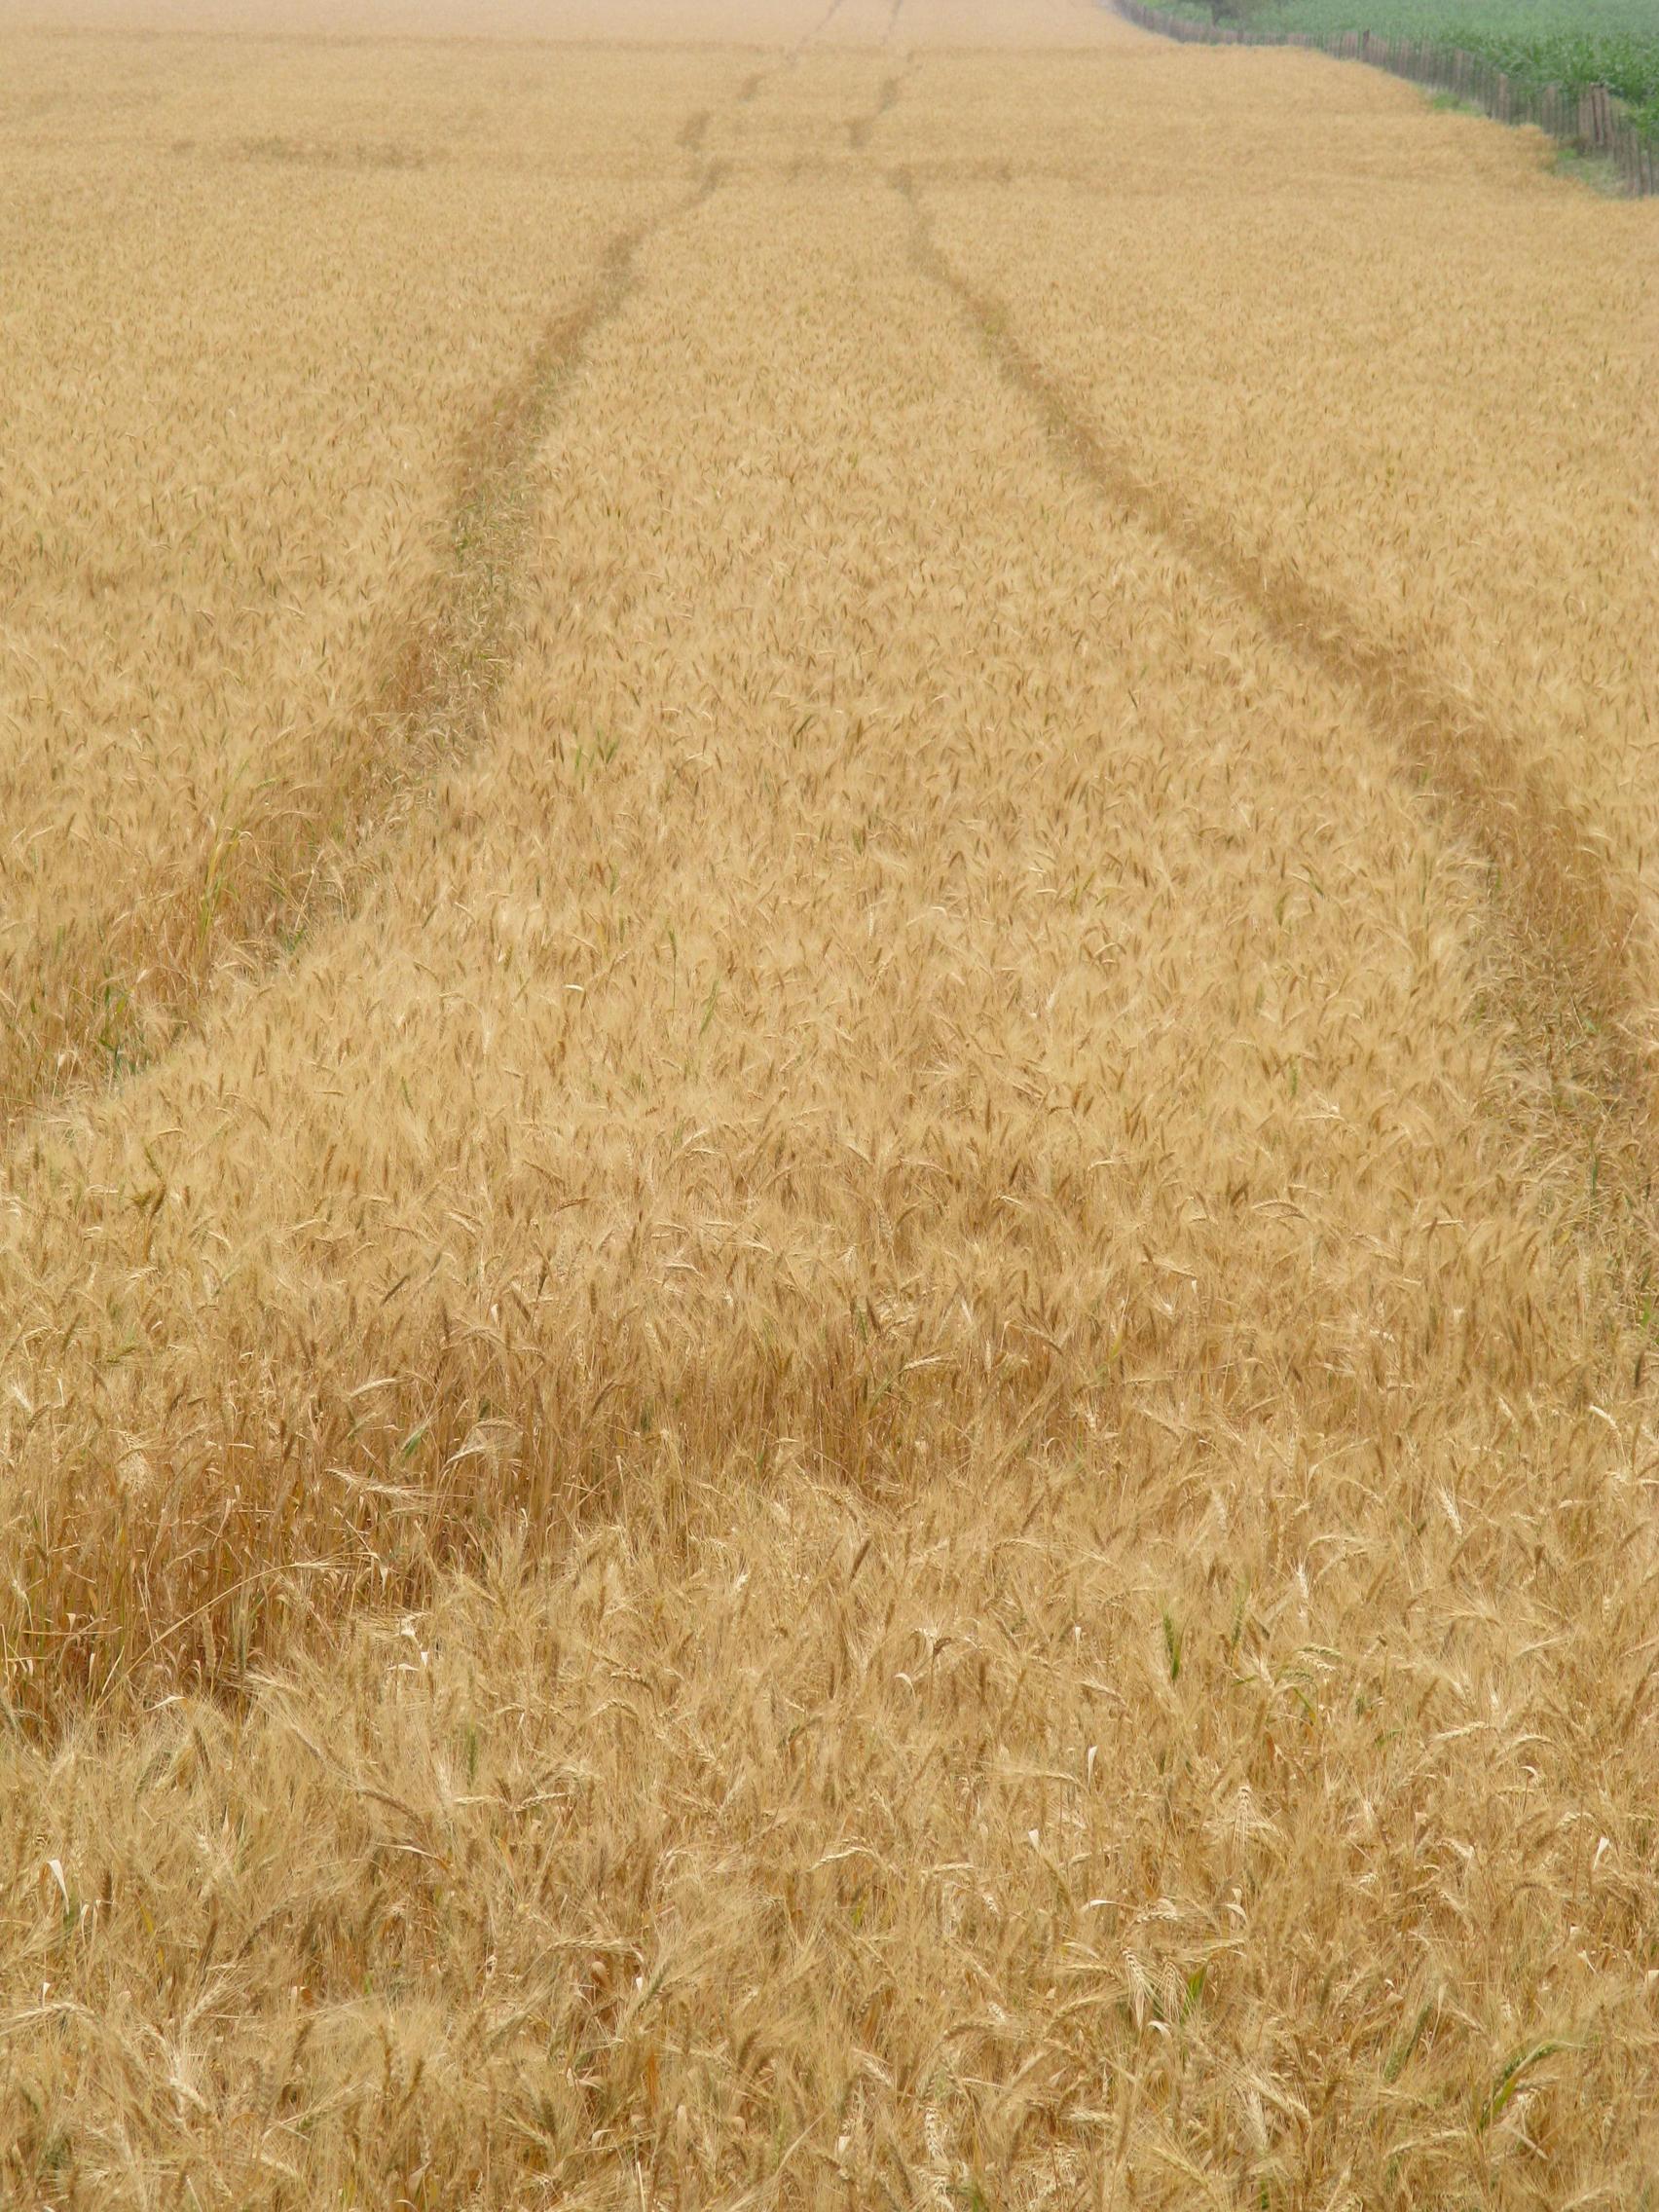 tfb_wheat_0942